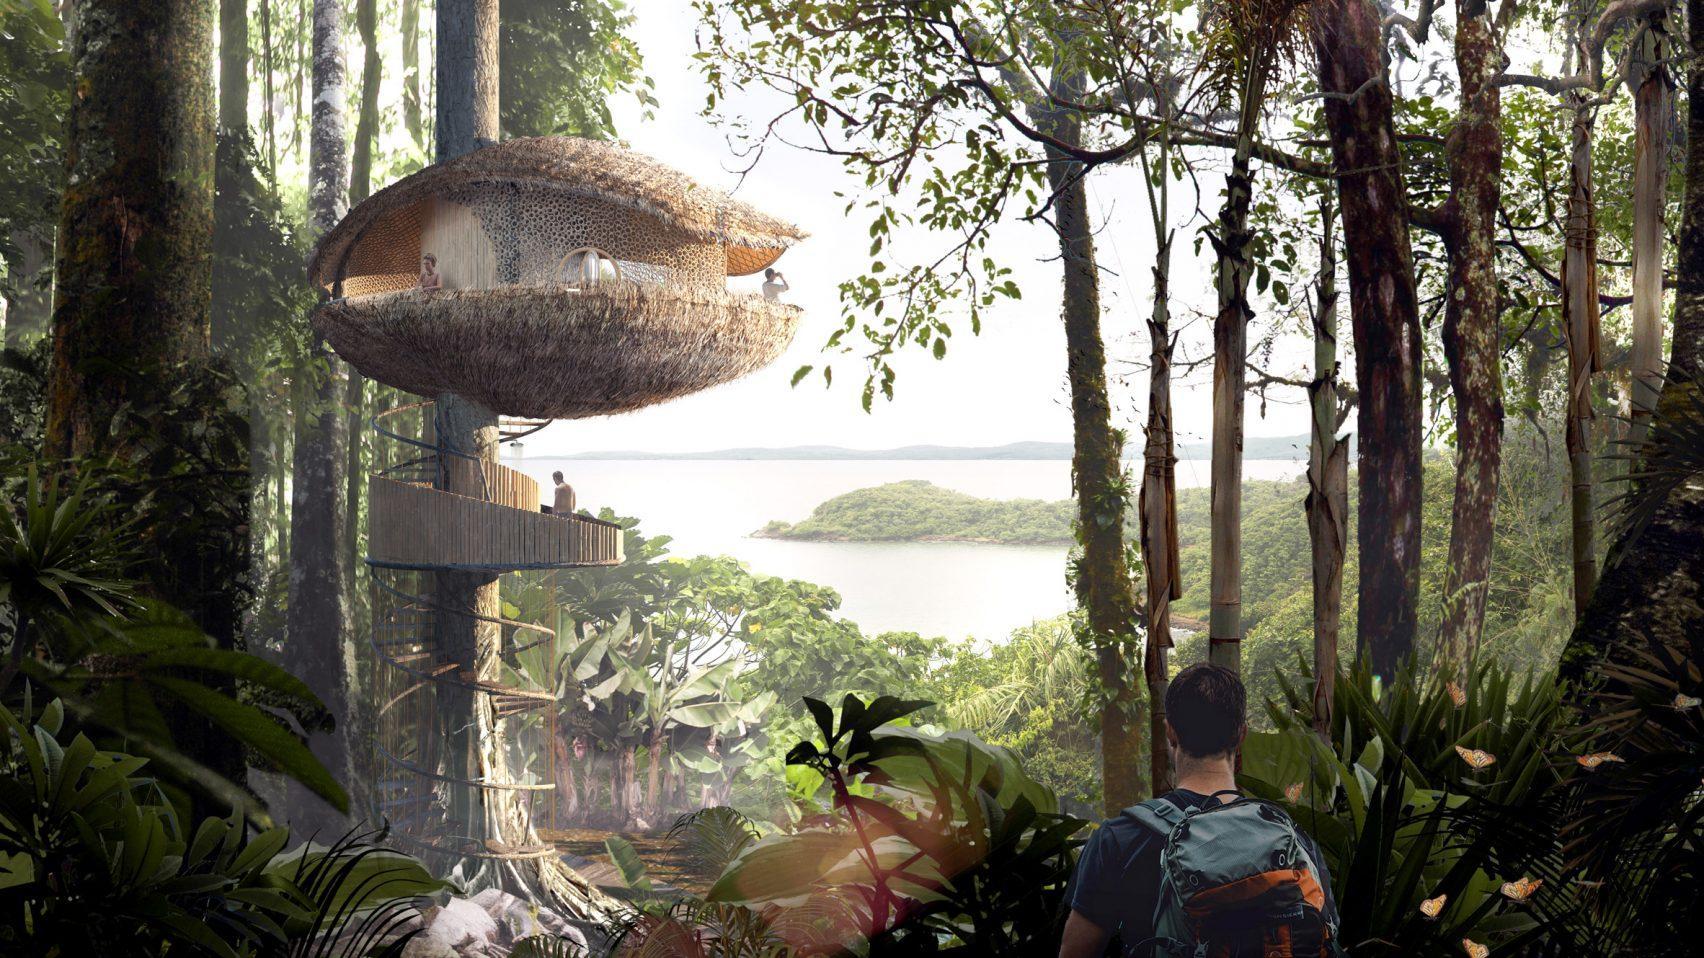 Baca Architects, Bíku Treehouse Retreat, concept for an eco hotel, Panama Island, 2017.